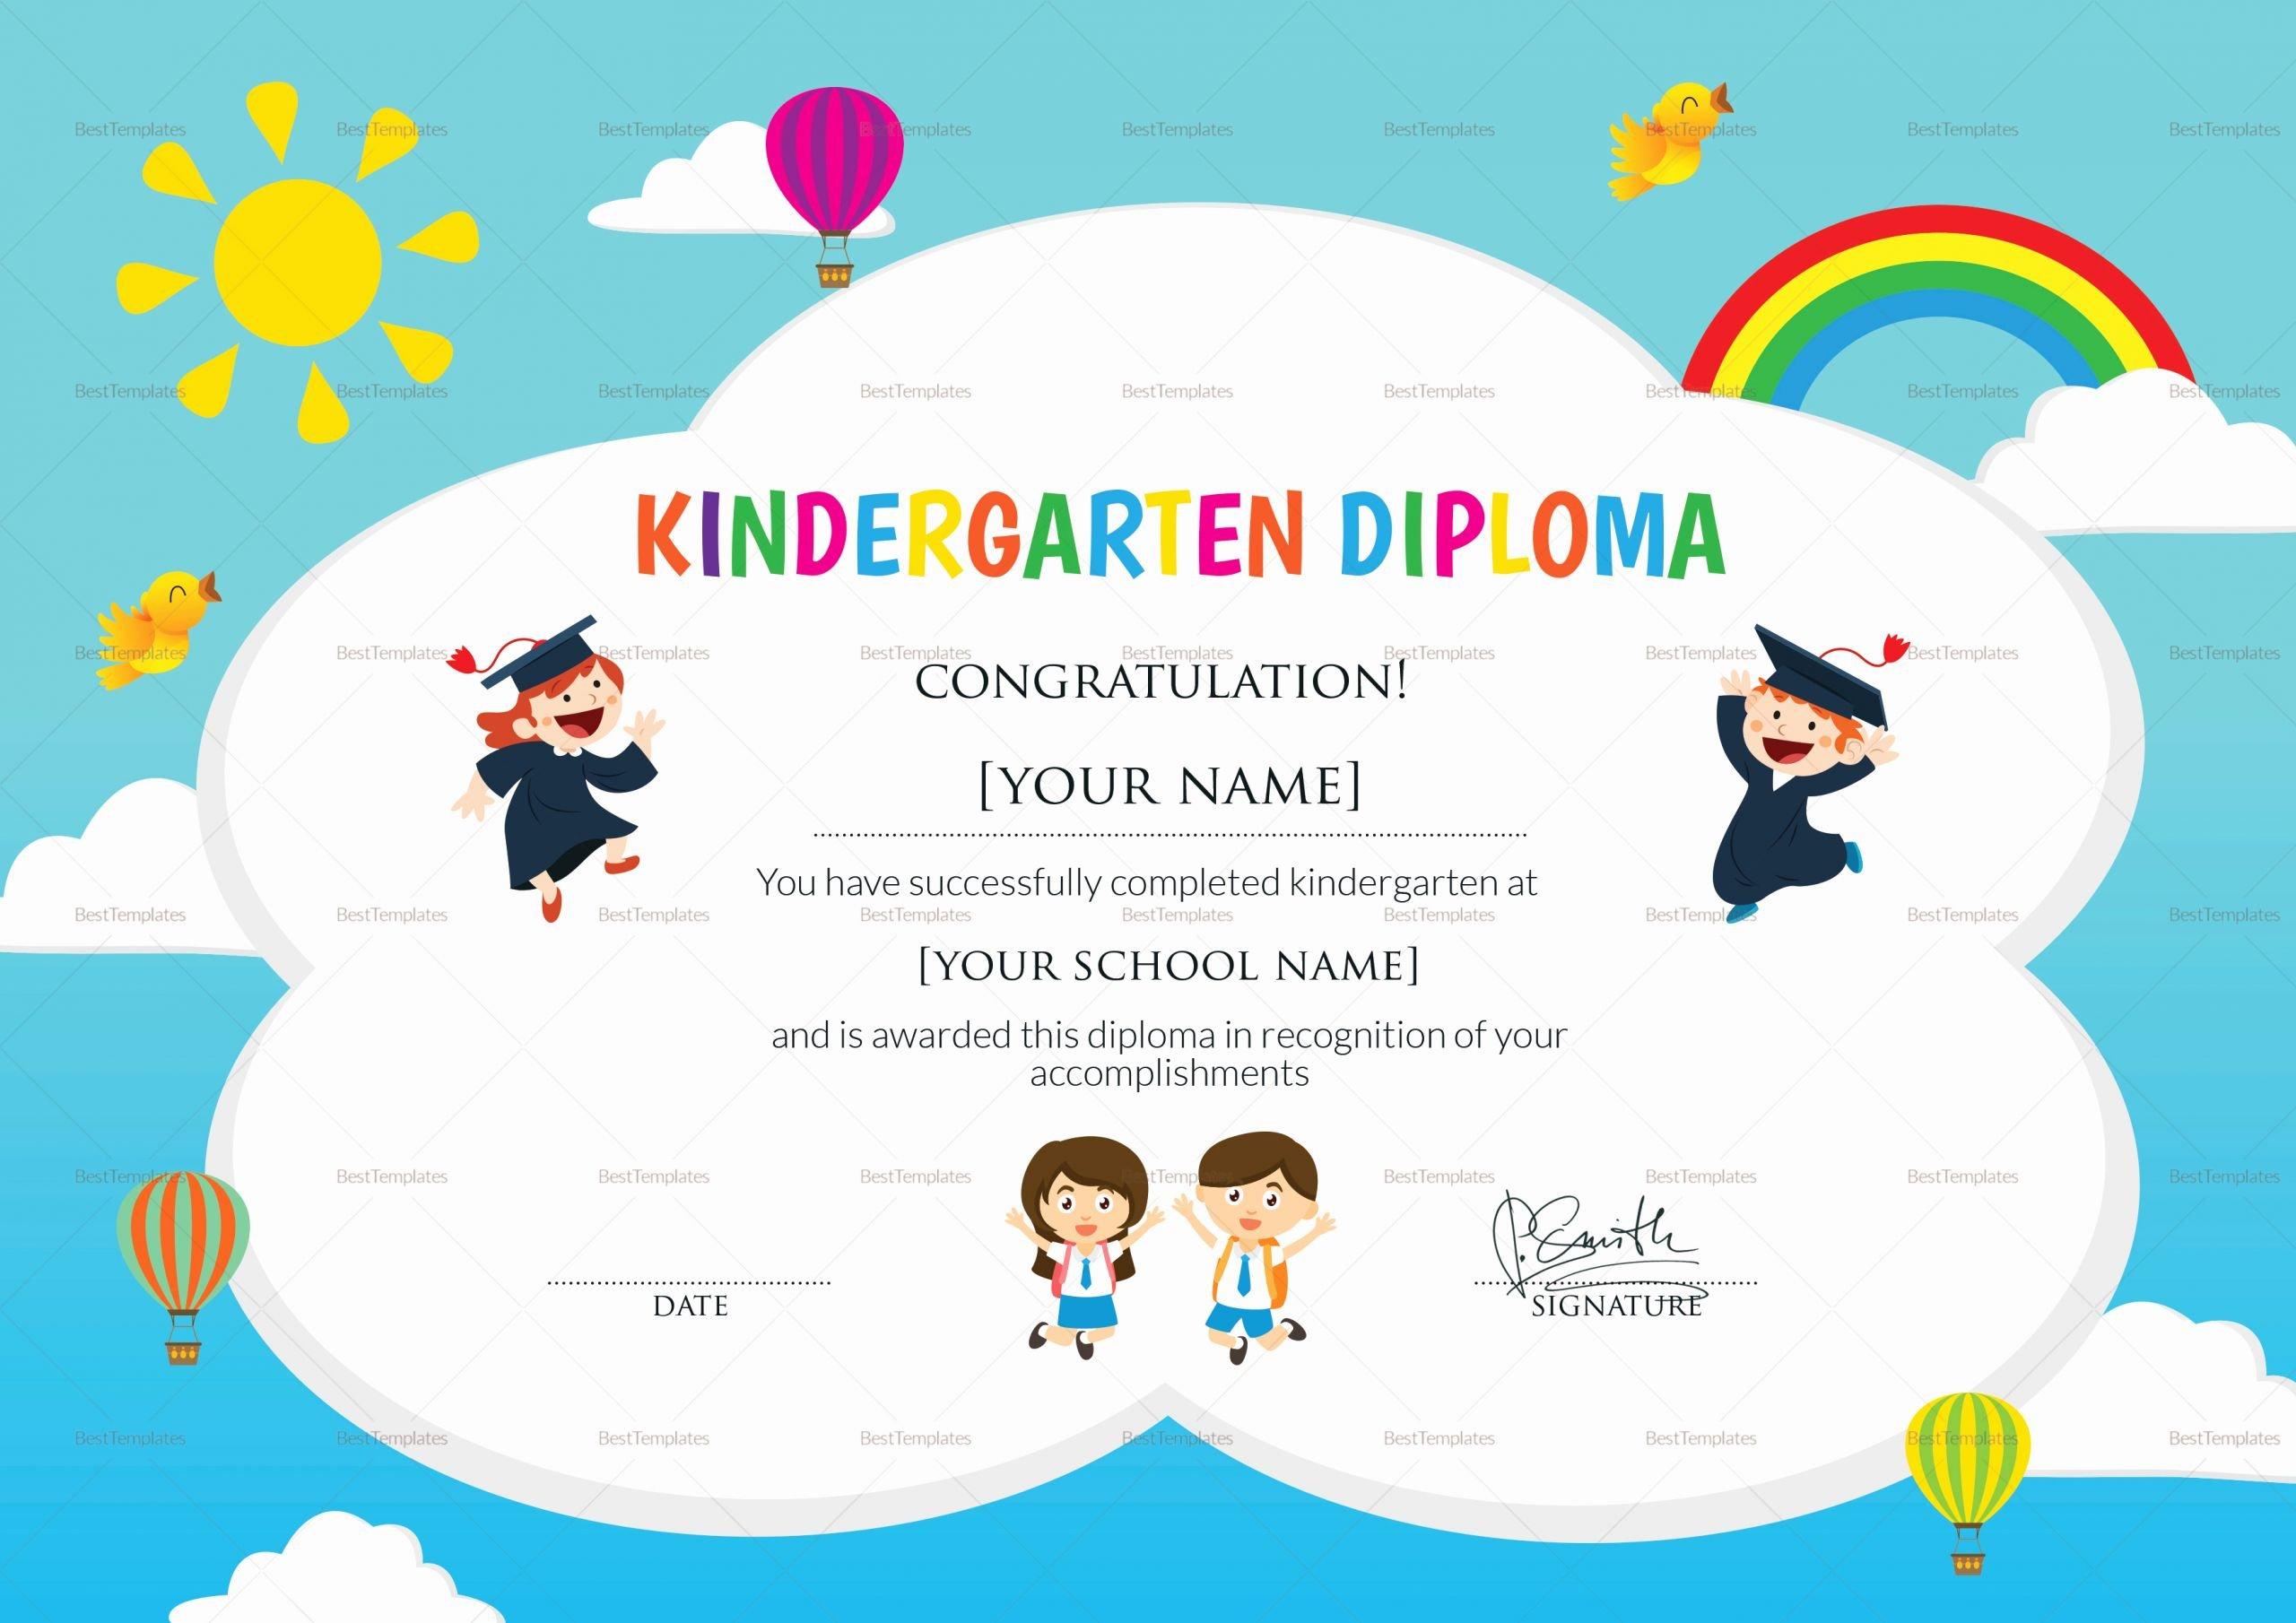 Preschool Graduation Certificate Template Inspirational Kindergarten Diploma Certificate Design Template In Psd Word